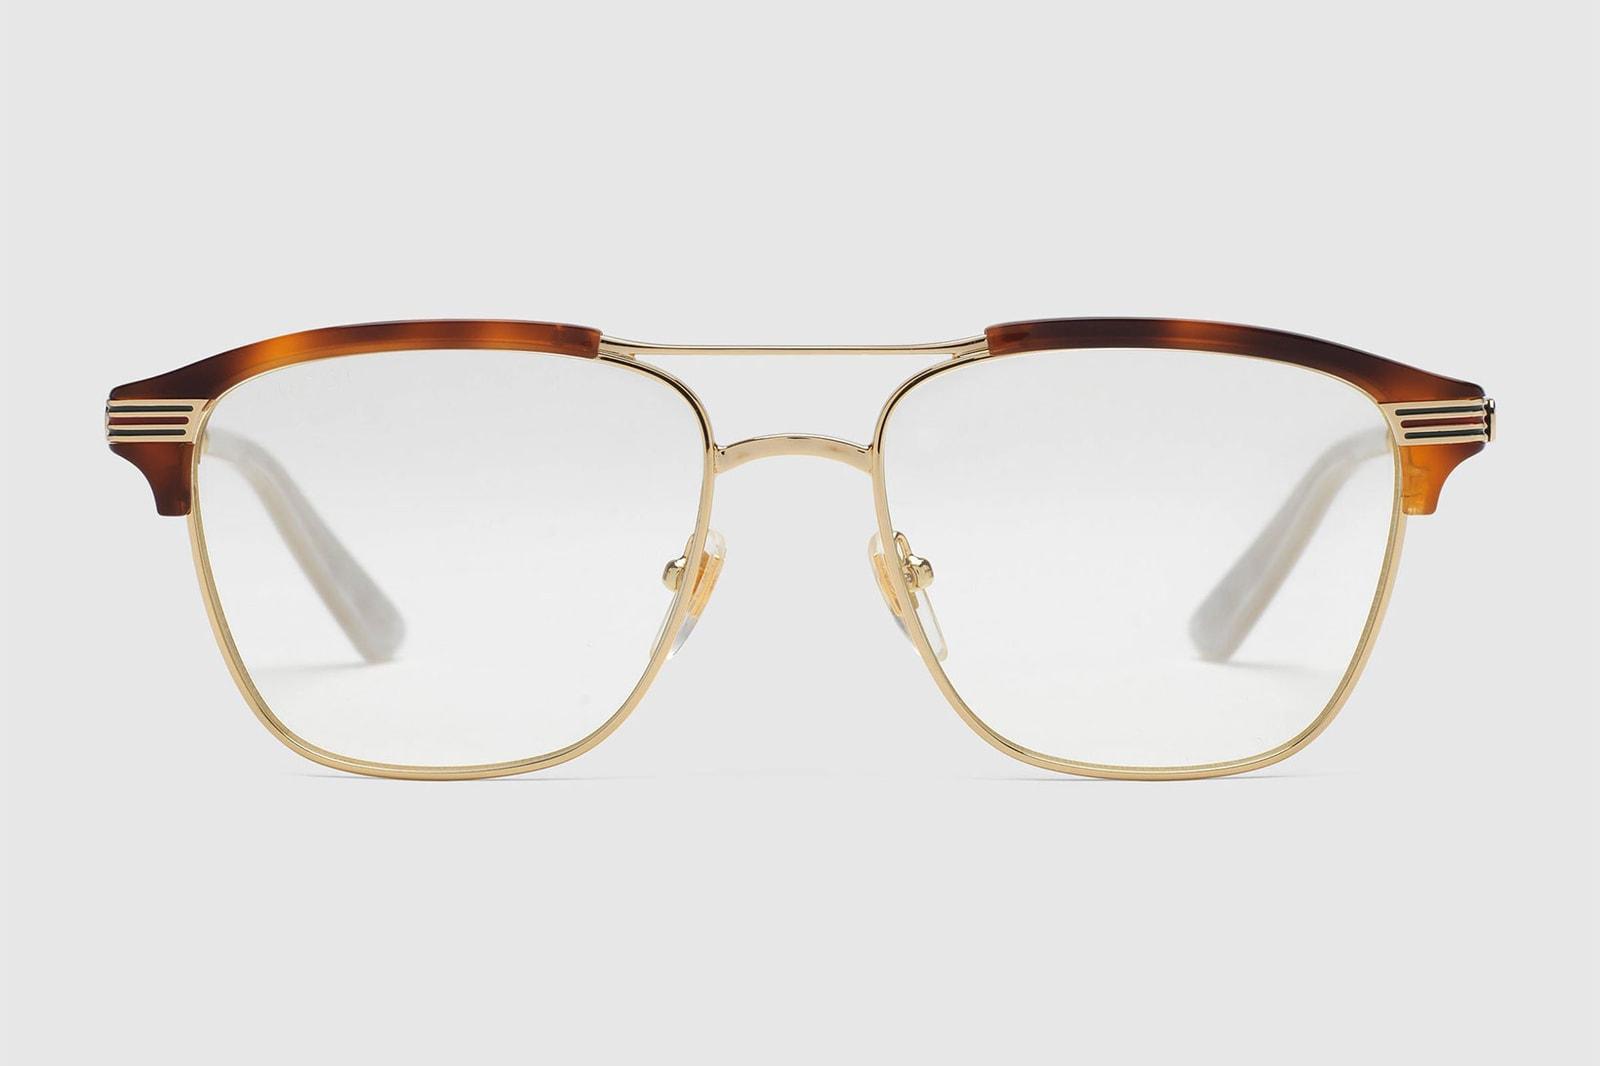 f7ebd41524b9 Gucci FW18 Sunglasses Optical Campaign Editorial Miink Singer Musician Gucci  Menswear Womenswear Fall Winter 2018